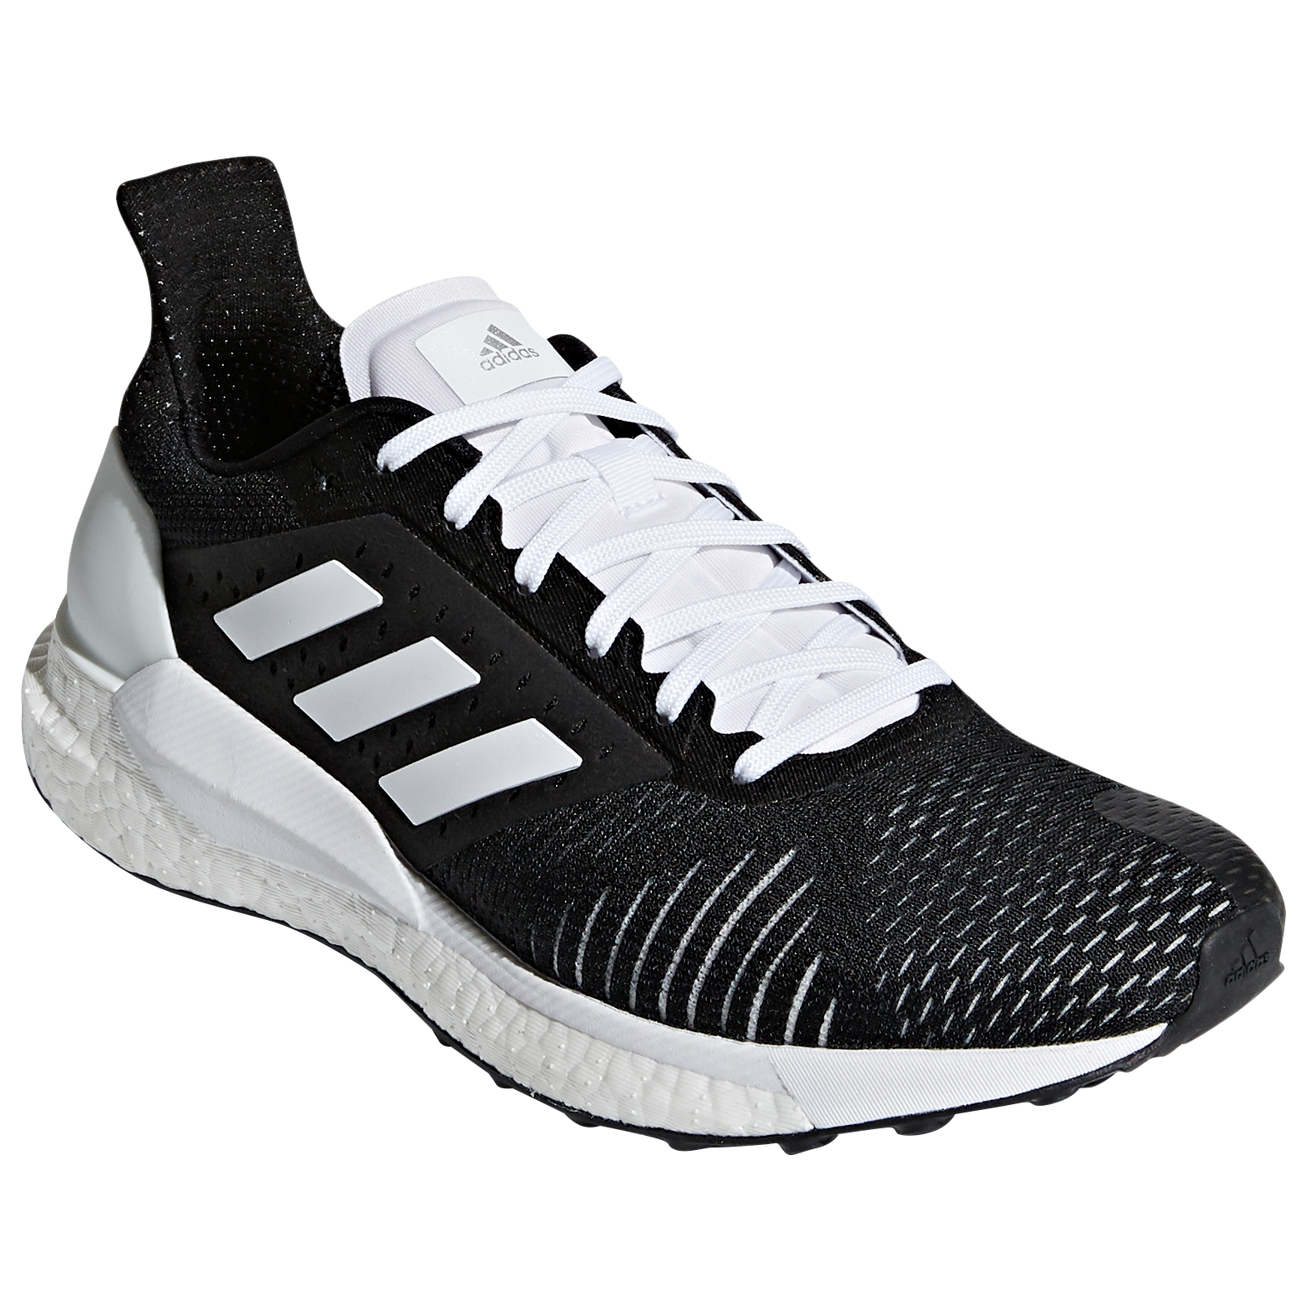 the latest 00a86 c9d80 adidas - Women's Solar Glide ST - Running shoes - Core Black / Core Black /  Ftwr White | 4,5 (UK)